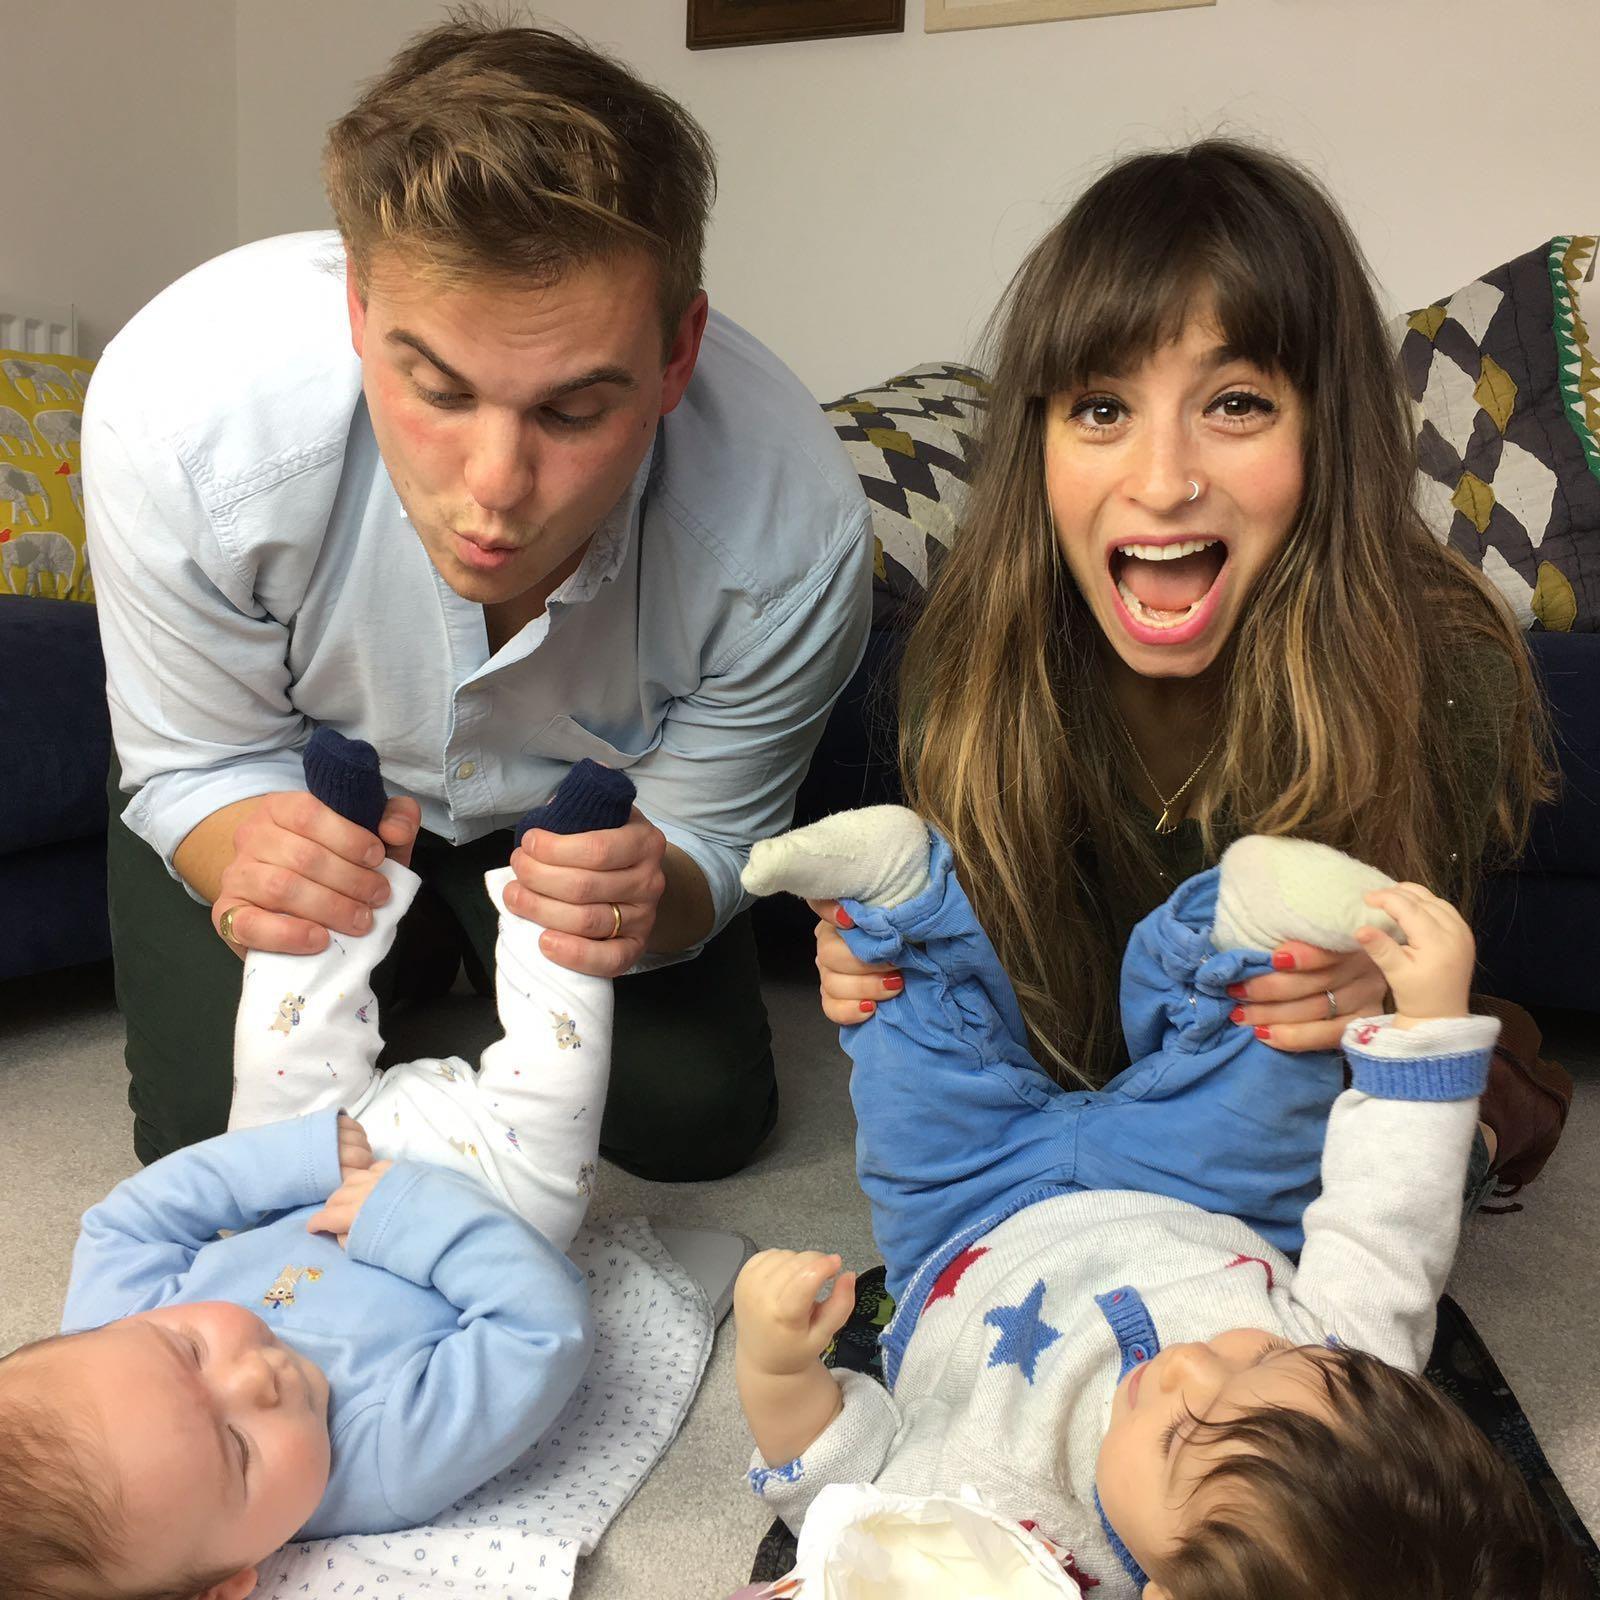 VLOG EXCLUSIVE: The Ultimate Parenting Challenge – Mum Vlogger vs Dad Blogger